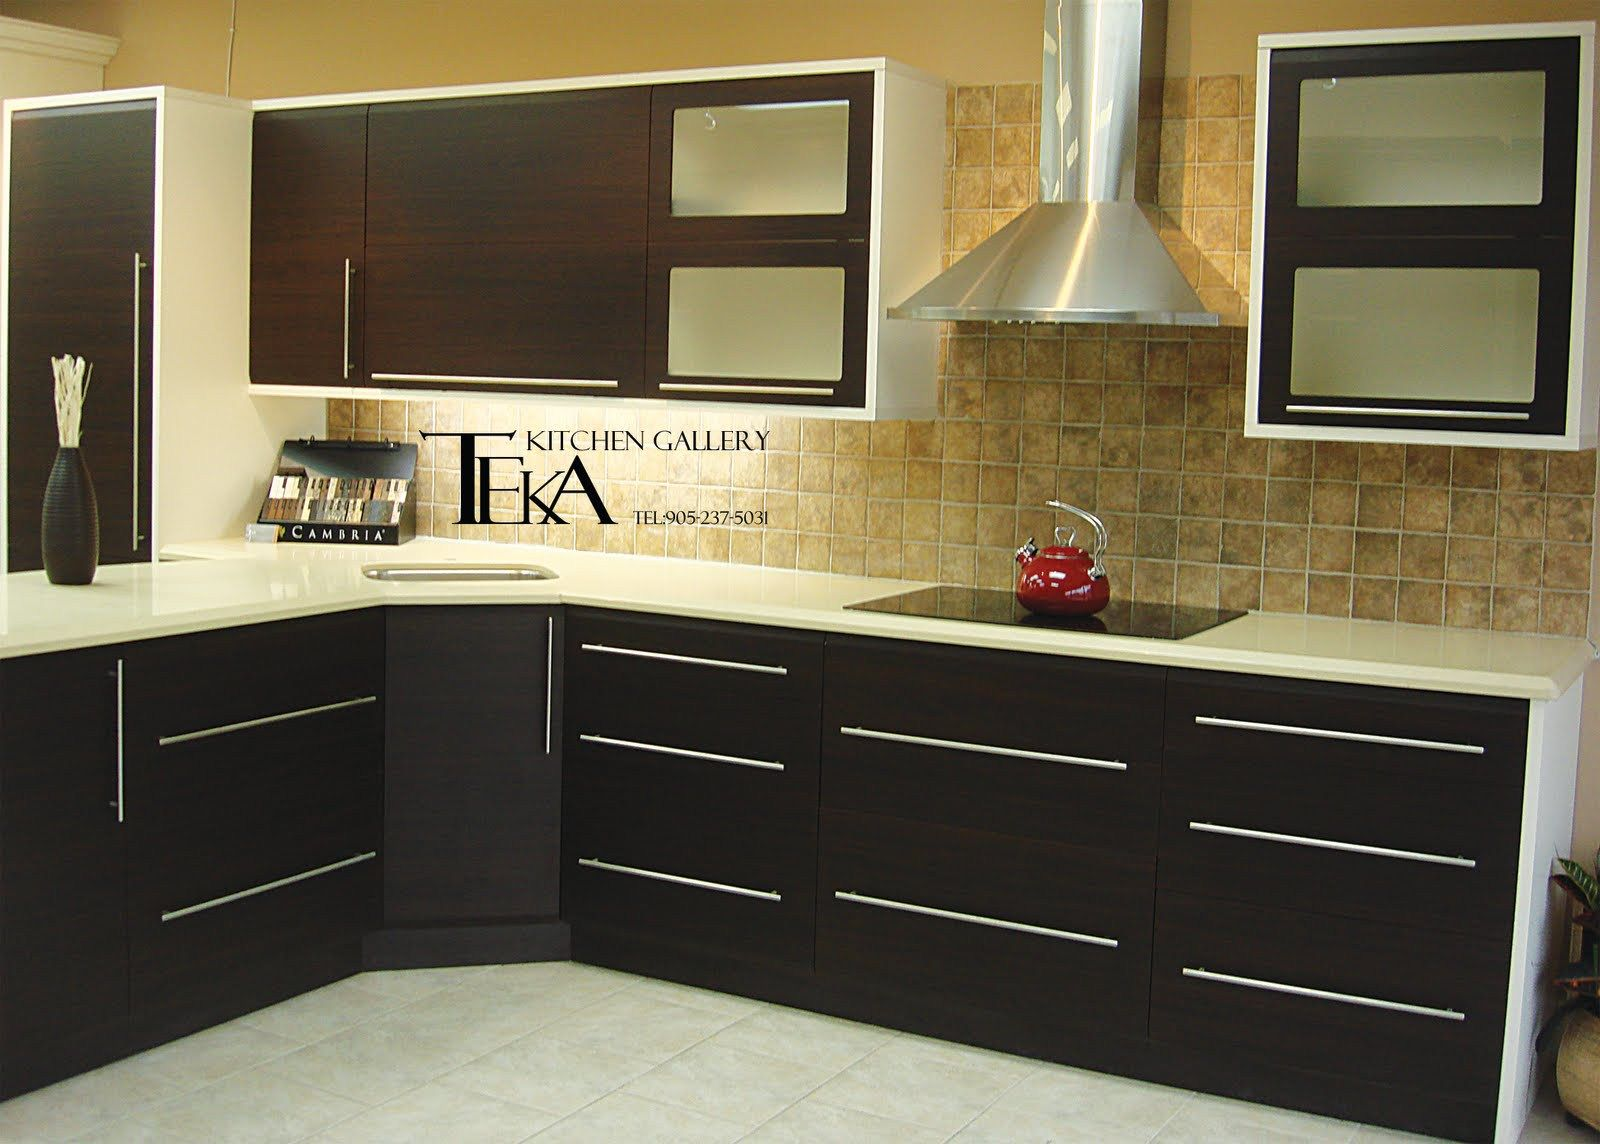 Simple Modern Kitchen Design Repost Inspiration Inspirational Kitchendesign Modern Simple Kitchen Remodel Simple Kitchen Design Kitchen Remodel Small